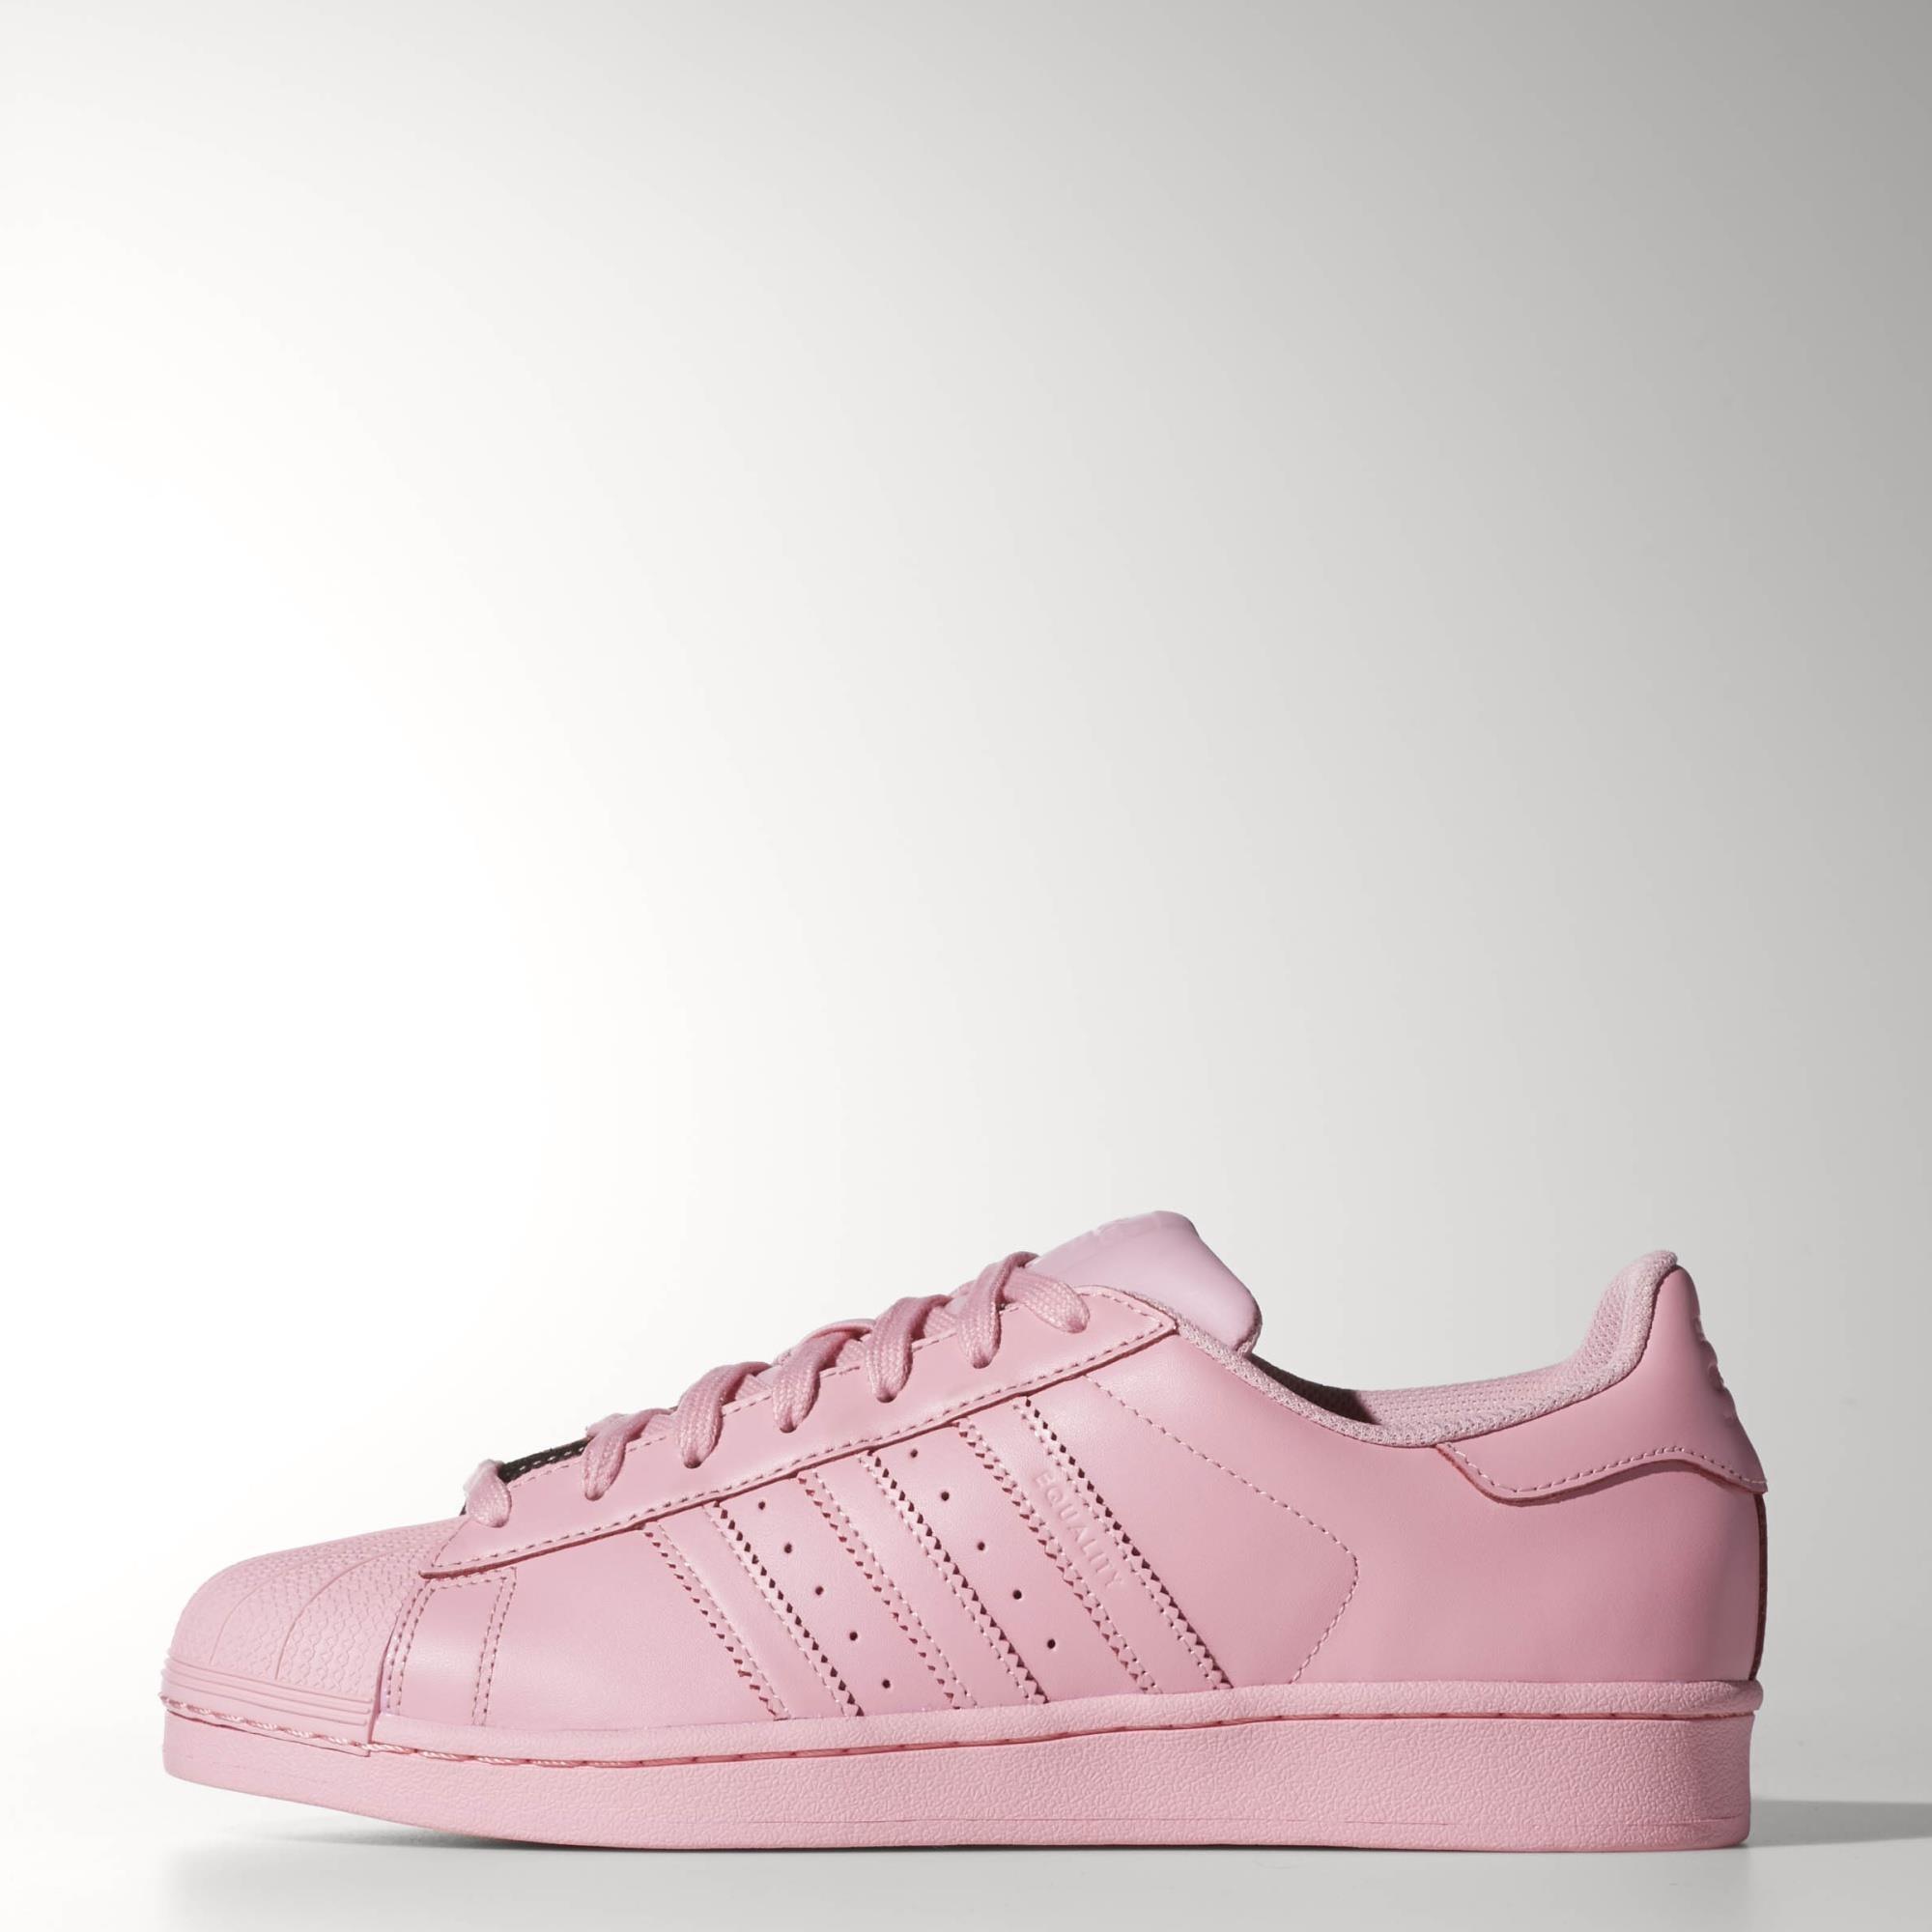 Adidas Pink Stripes